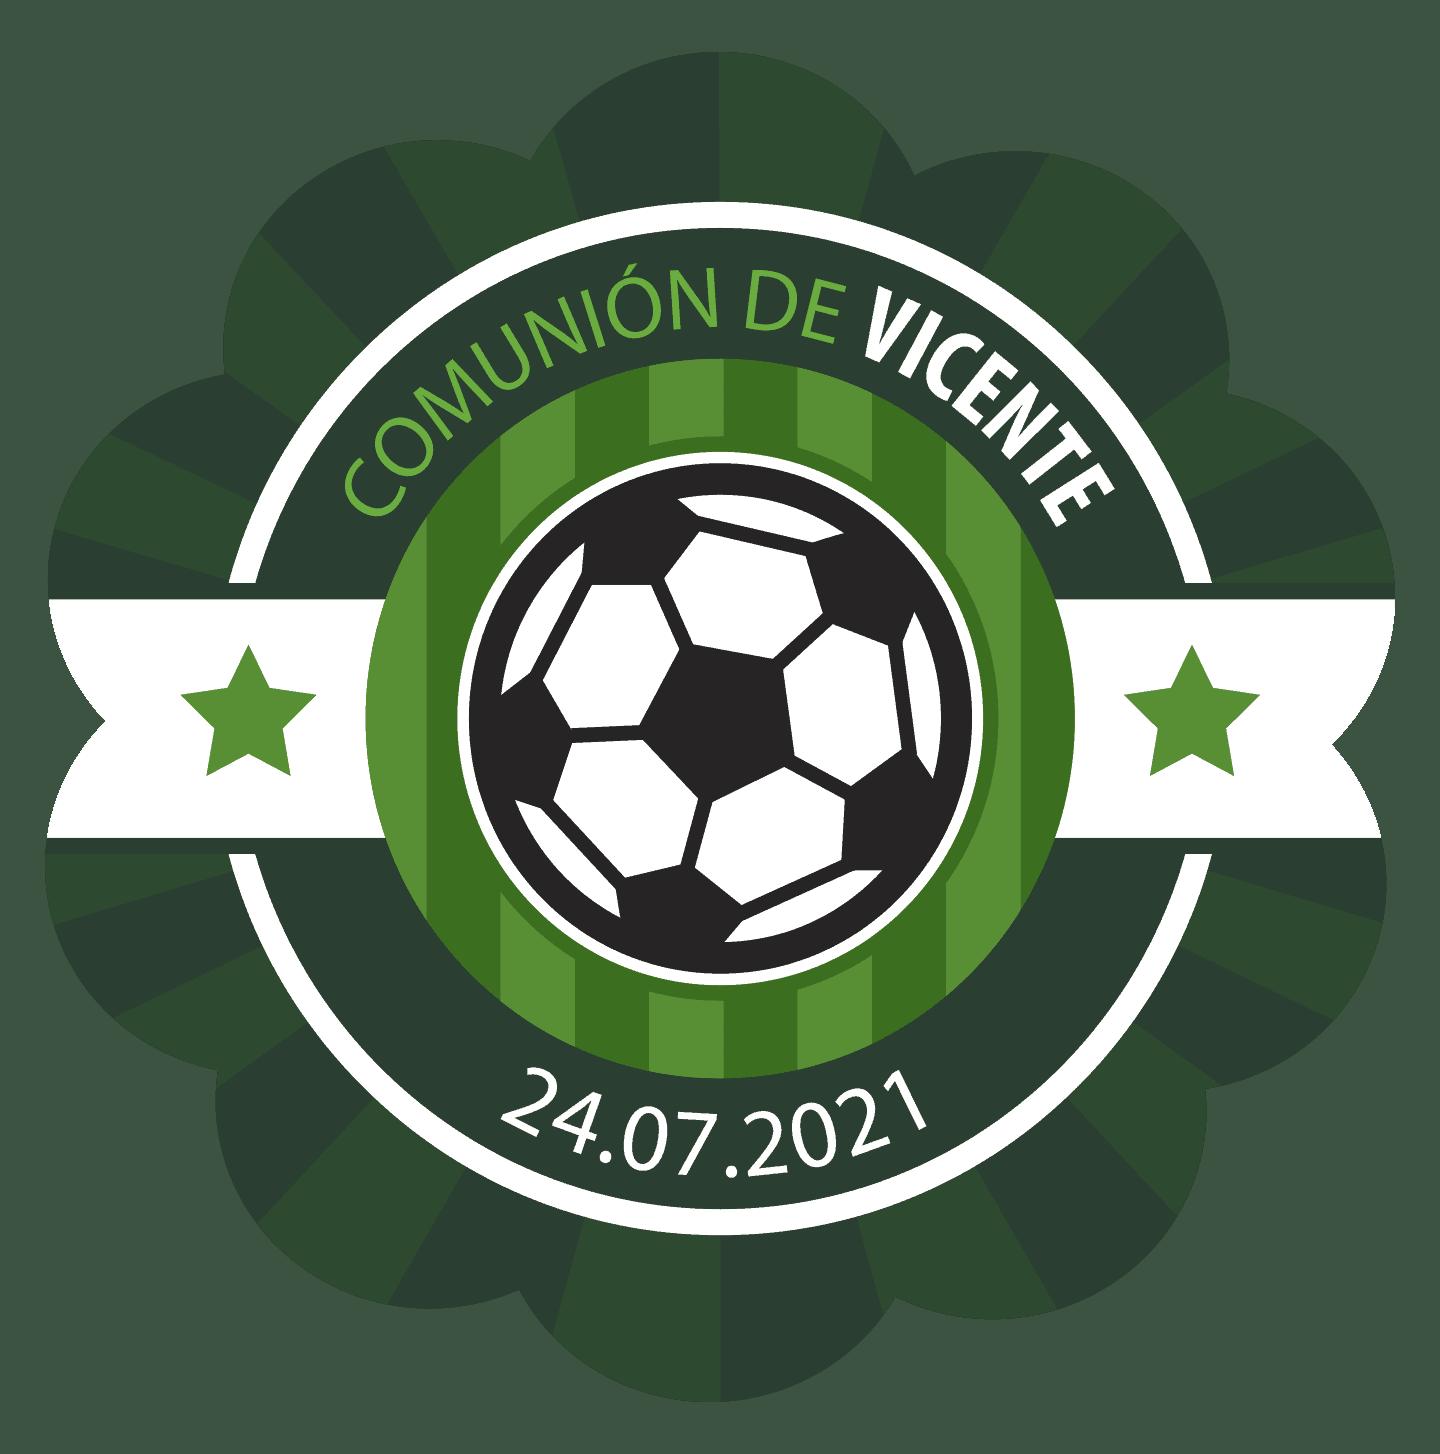 Etiqueta-Personalizada-futbol-Comunion